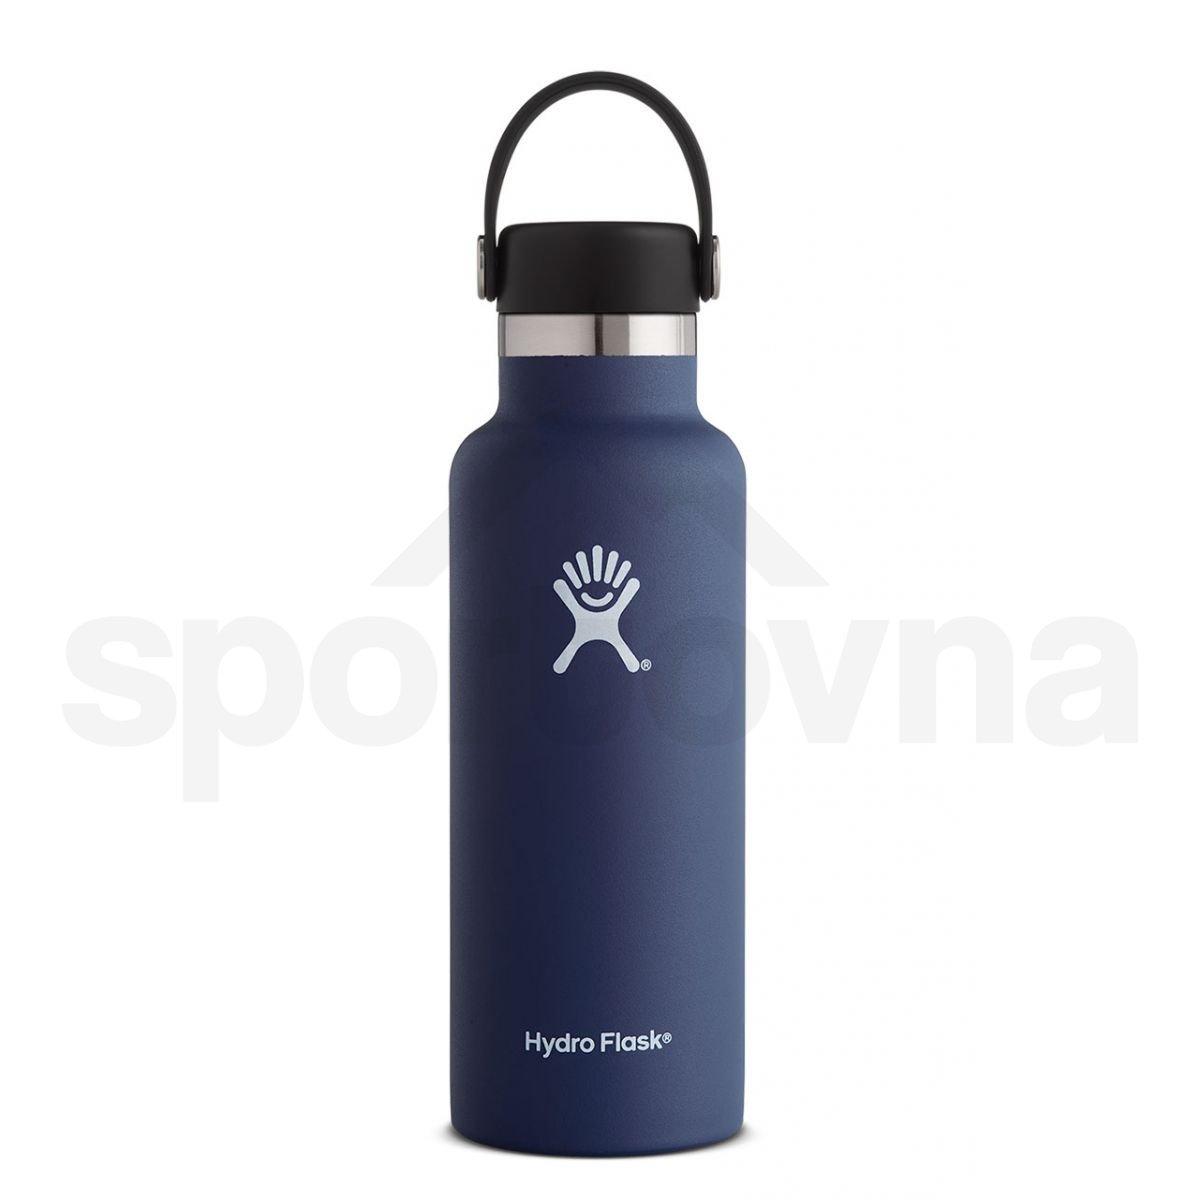 S18SX001 hydro flask 18 cobalt